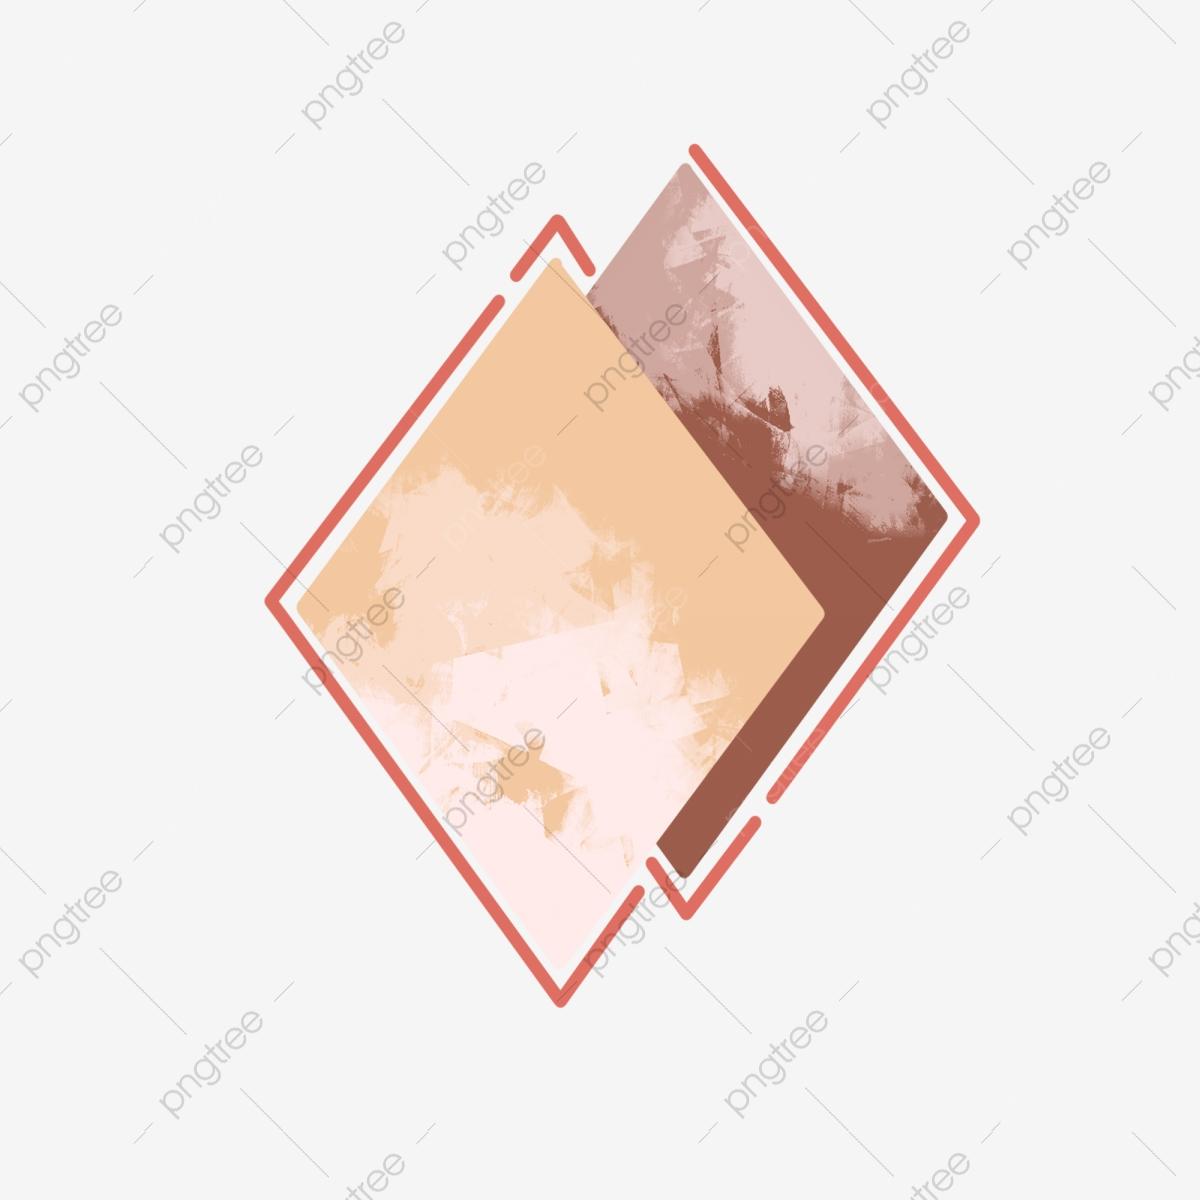 Diamond clipart minimalist. Simple border element decorative